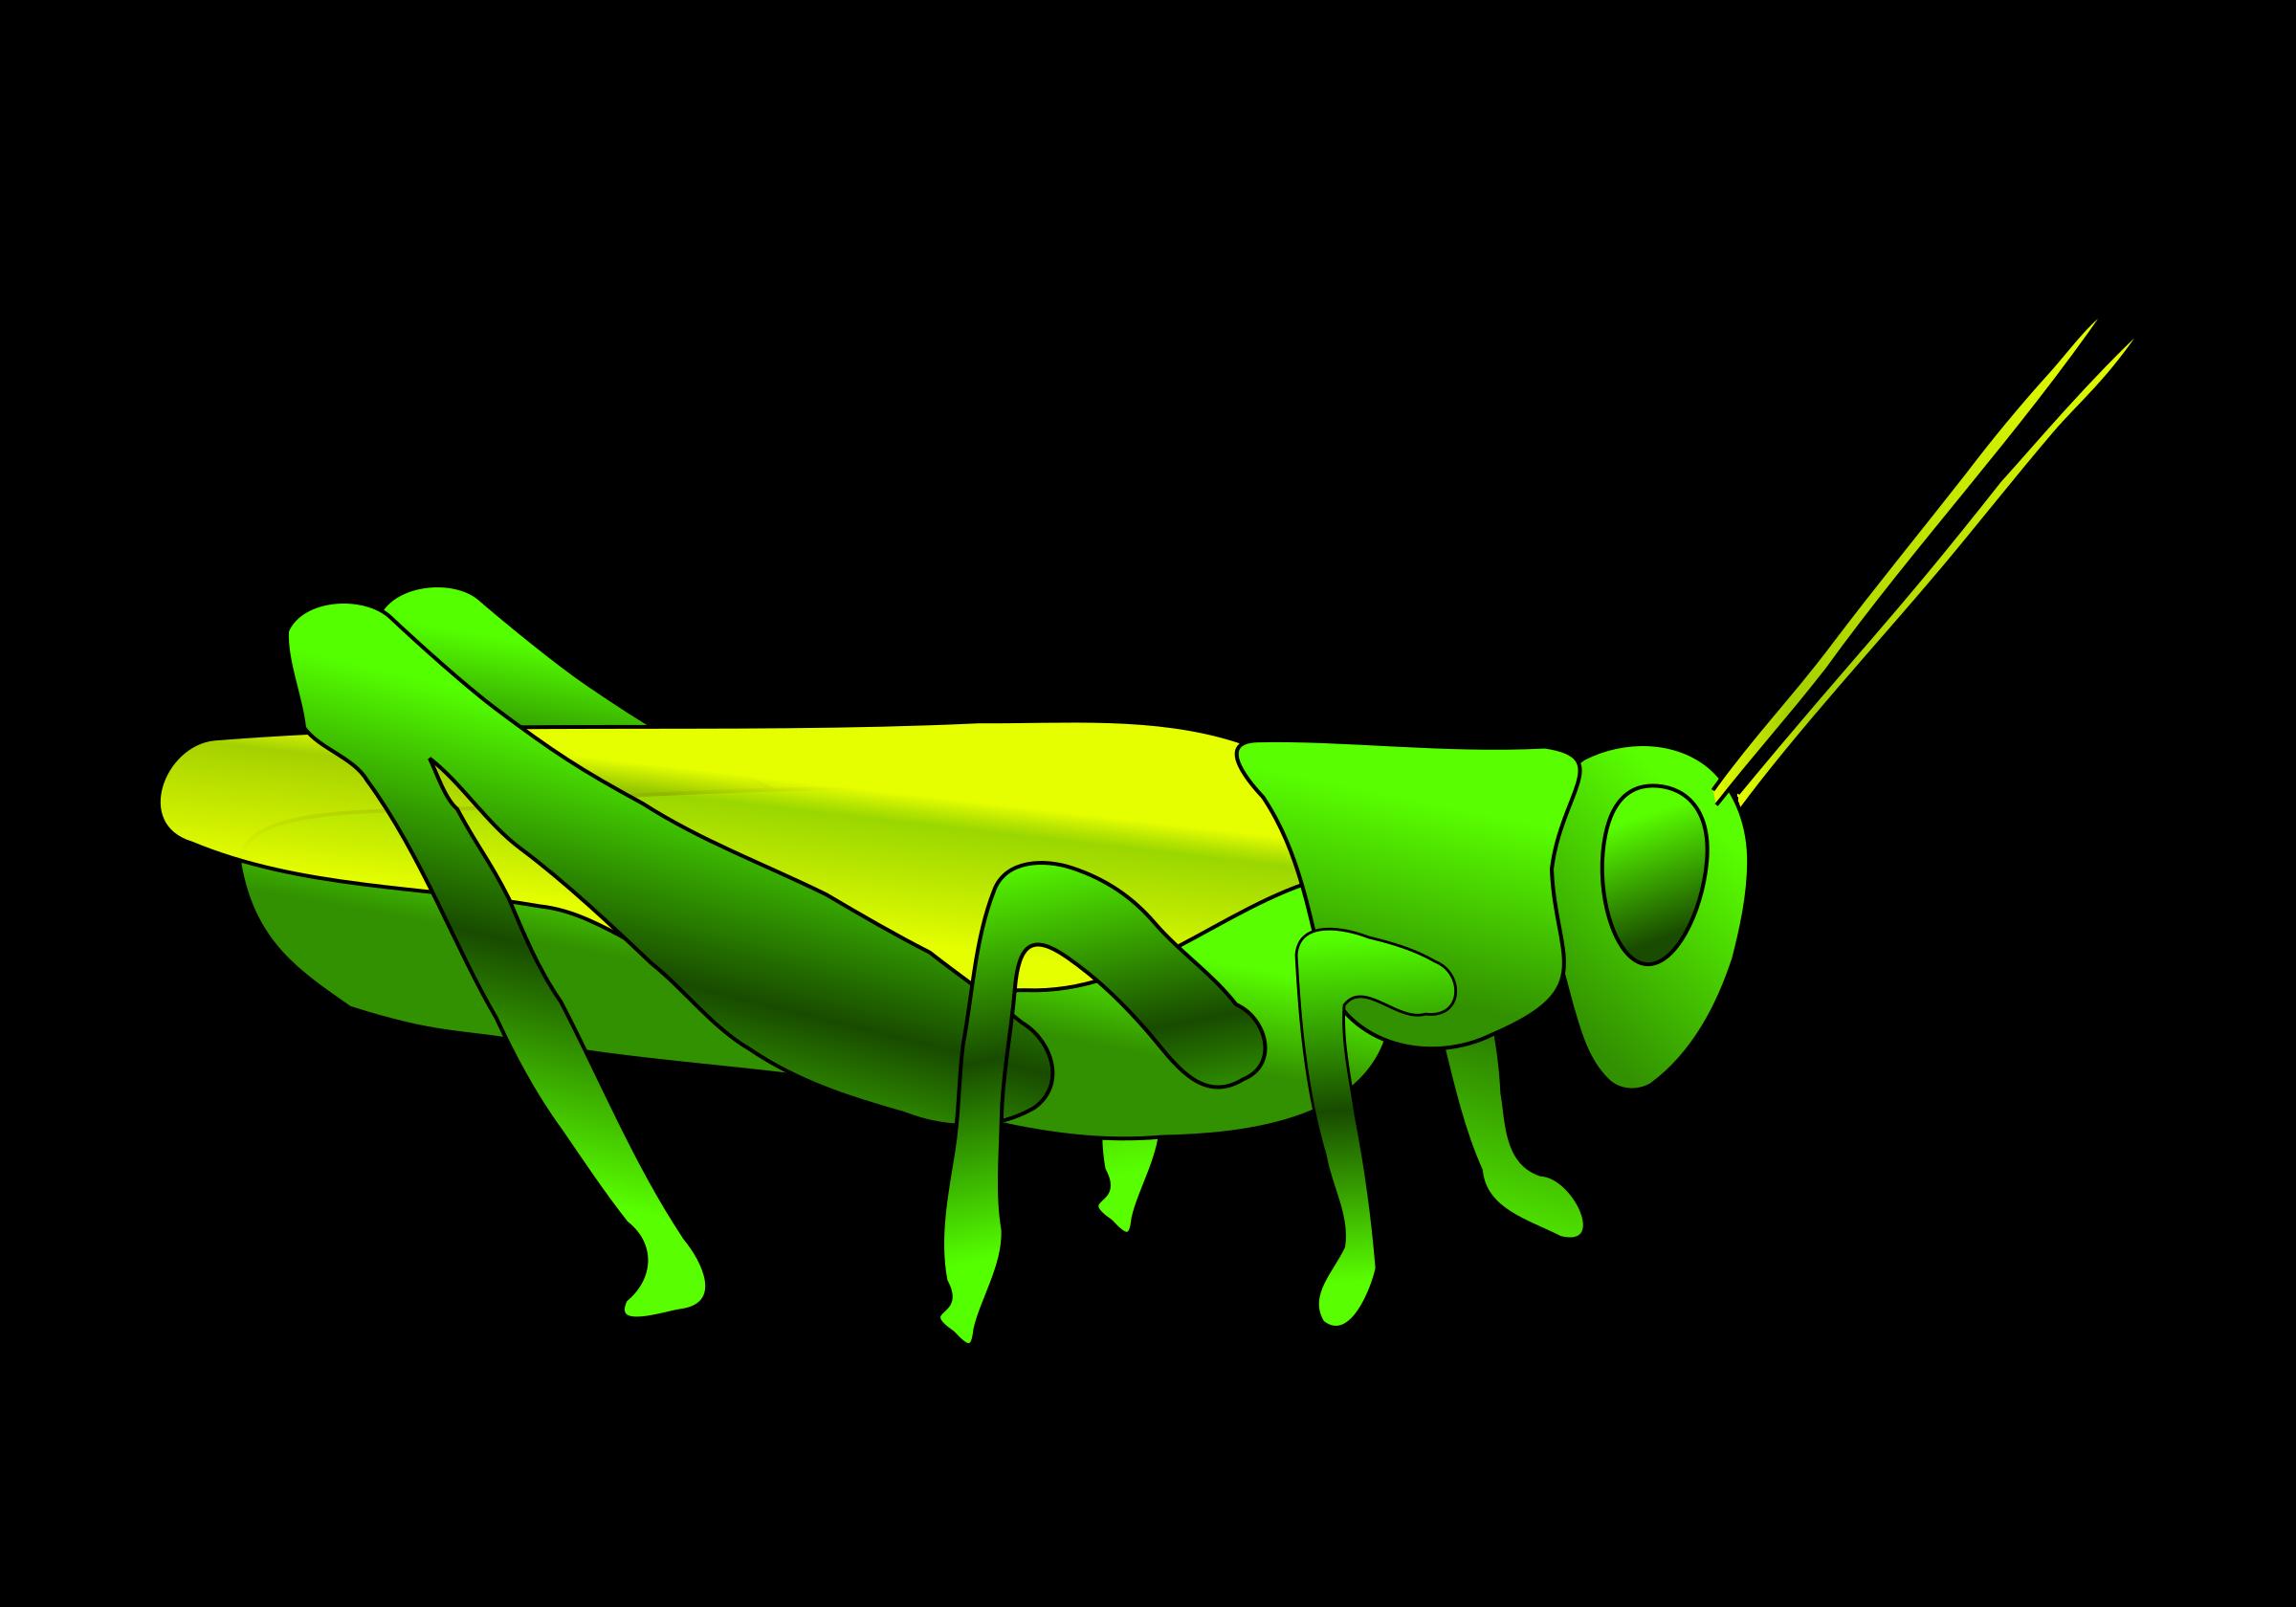 image black and white download . Grasshopper clipart invertebrate